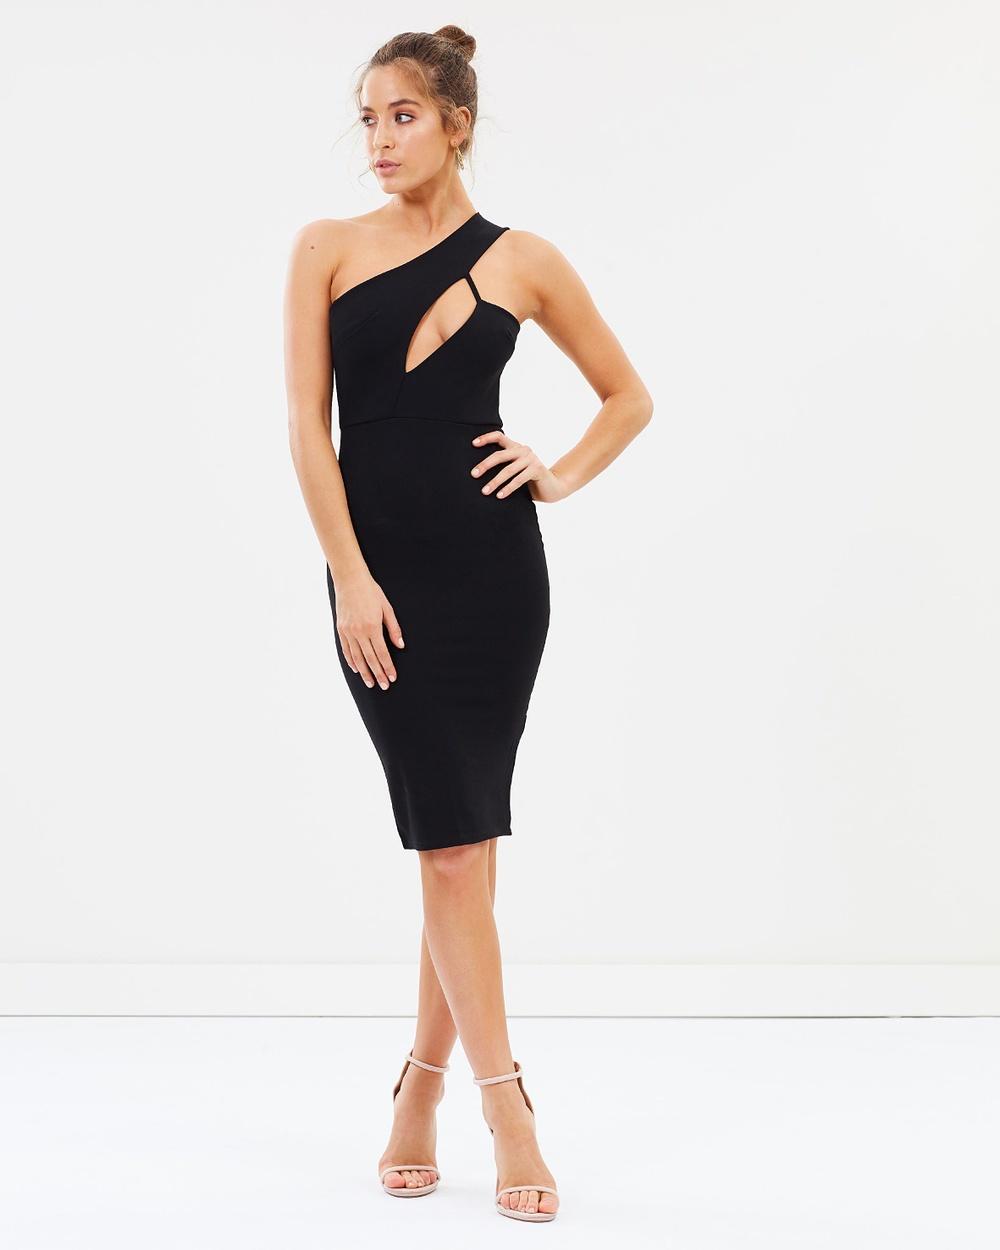 Missguided One Shoulder Midi Dress Bodycon Dresses Black One Shoulder Midi Dress